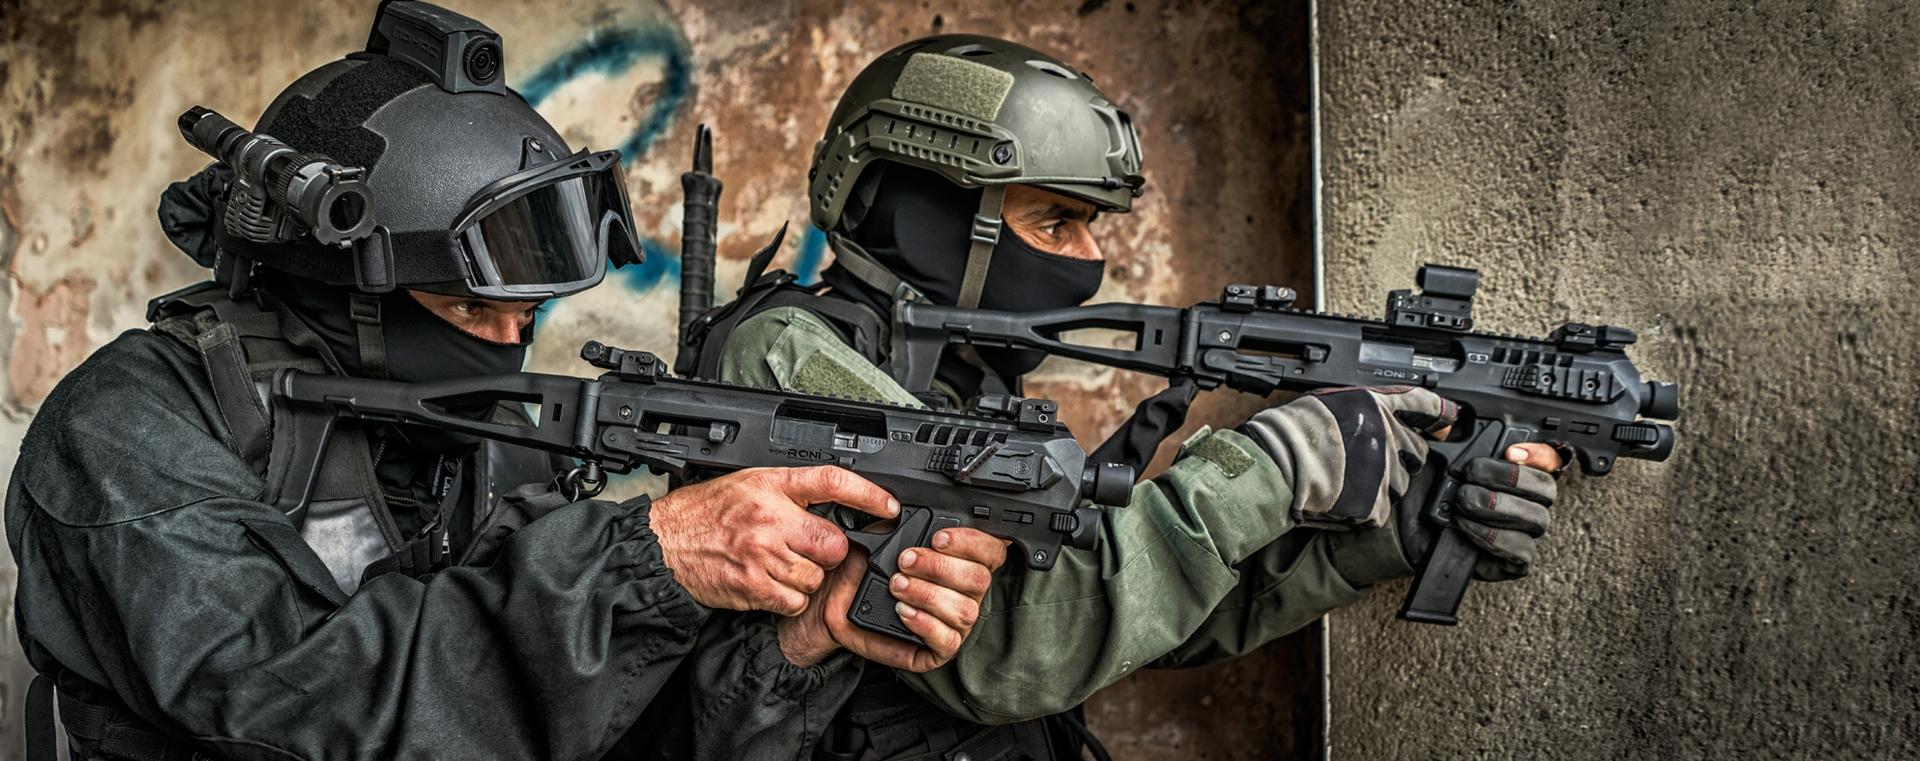 pistol conversion kits